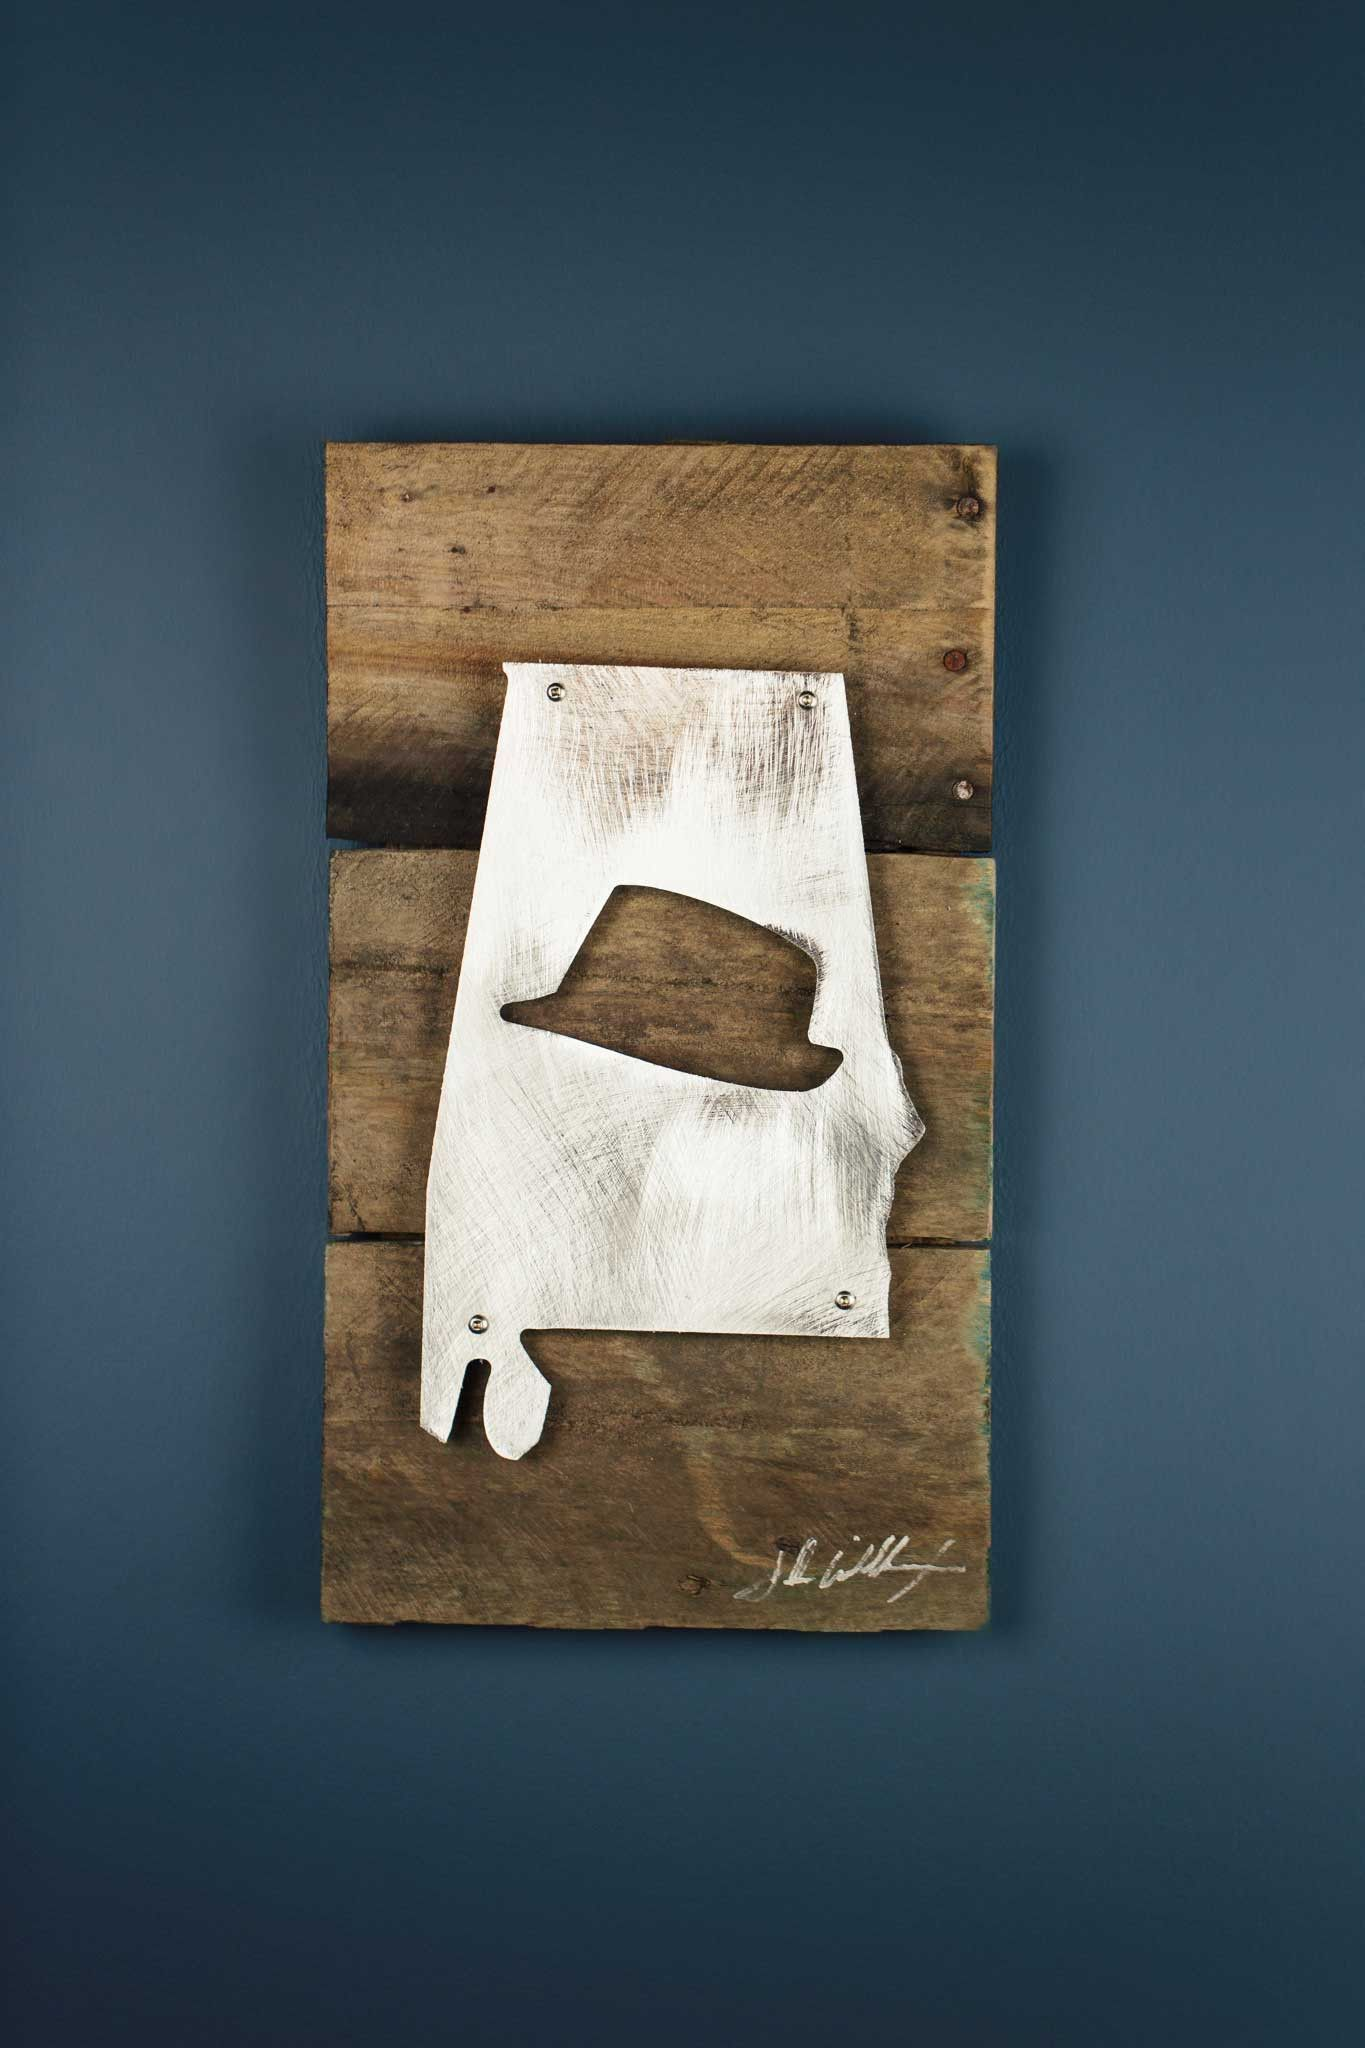 Alabama Fedora Reclaimed Wood & Shaped Metal Art | Products | Pinterest